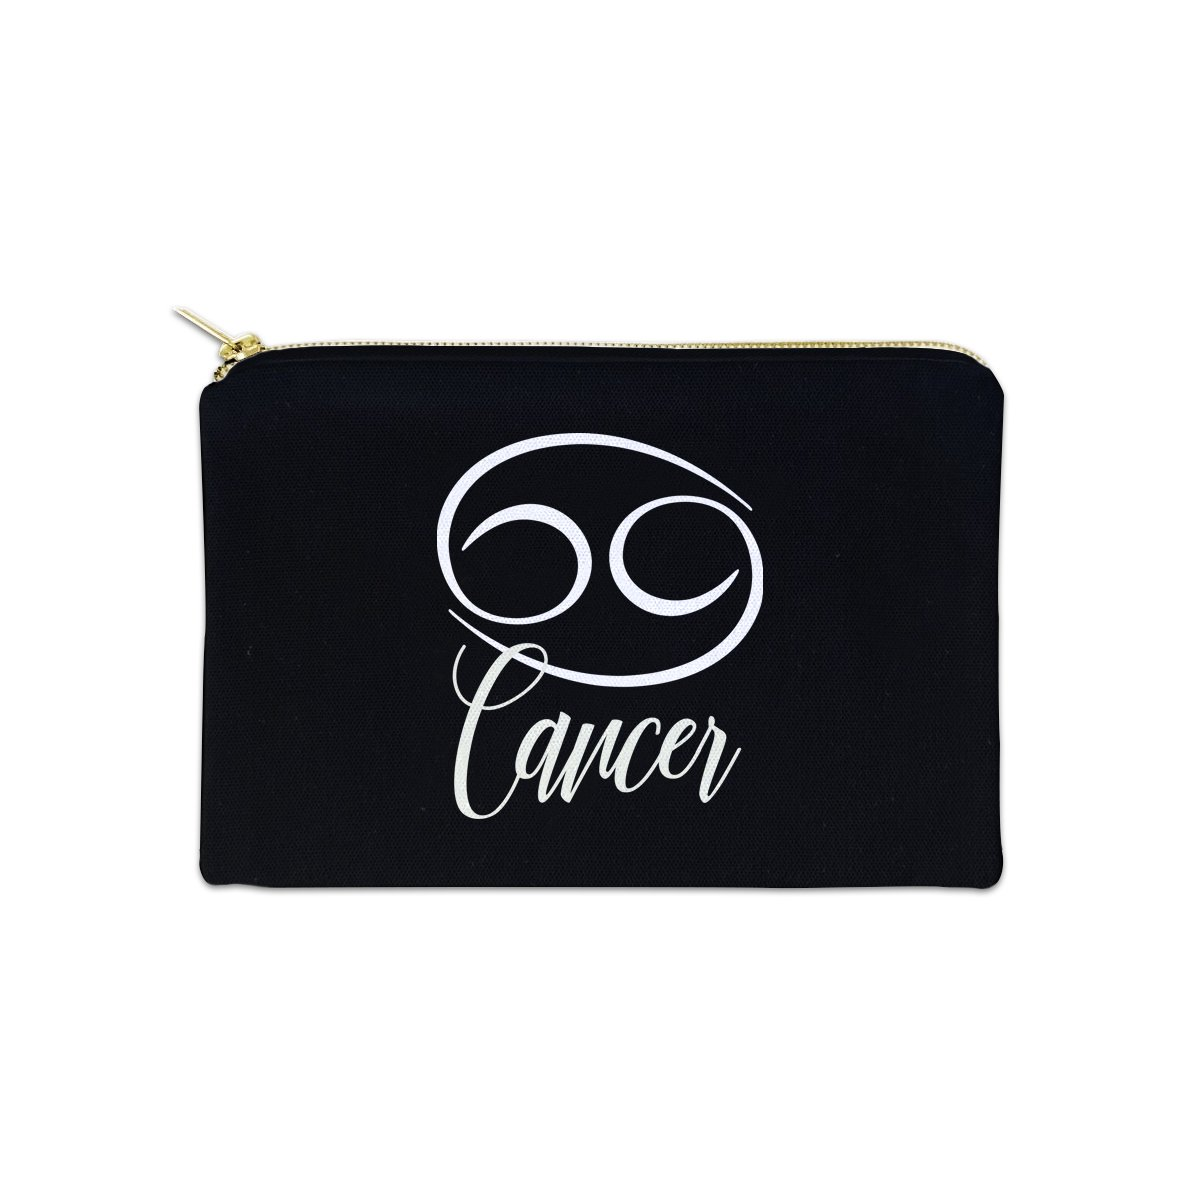 Cancer Zodiac Sign 12 oz Cosmetic Makeup Cotton Canvas Bag - (Black Canvas)